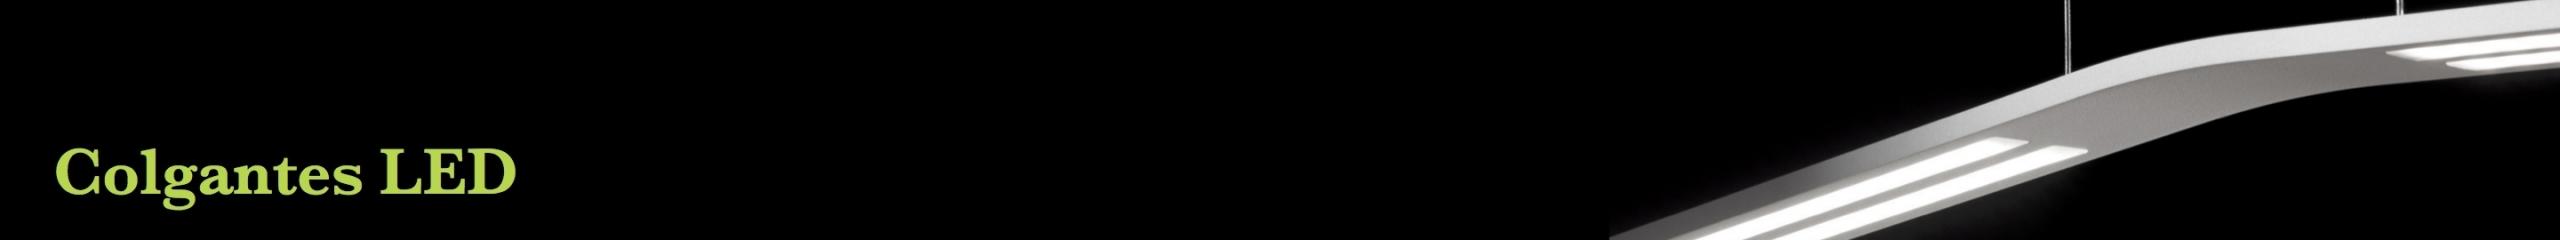 Colgantes Techo LED